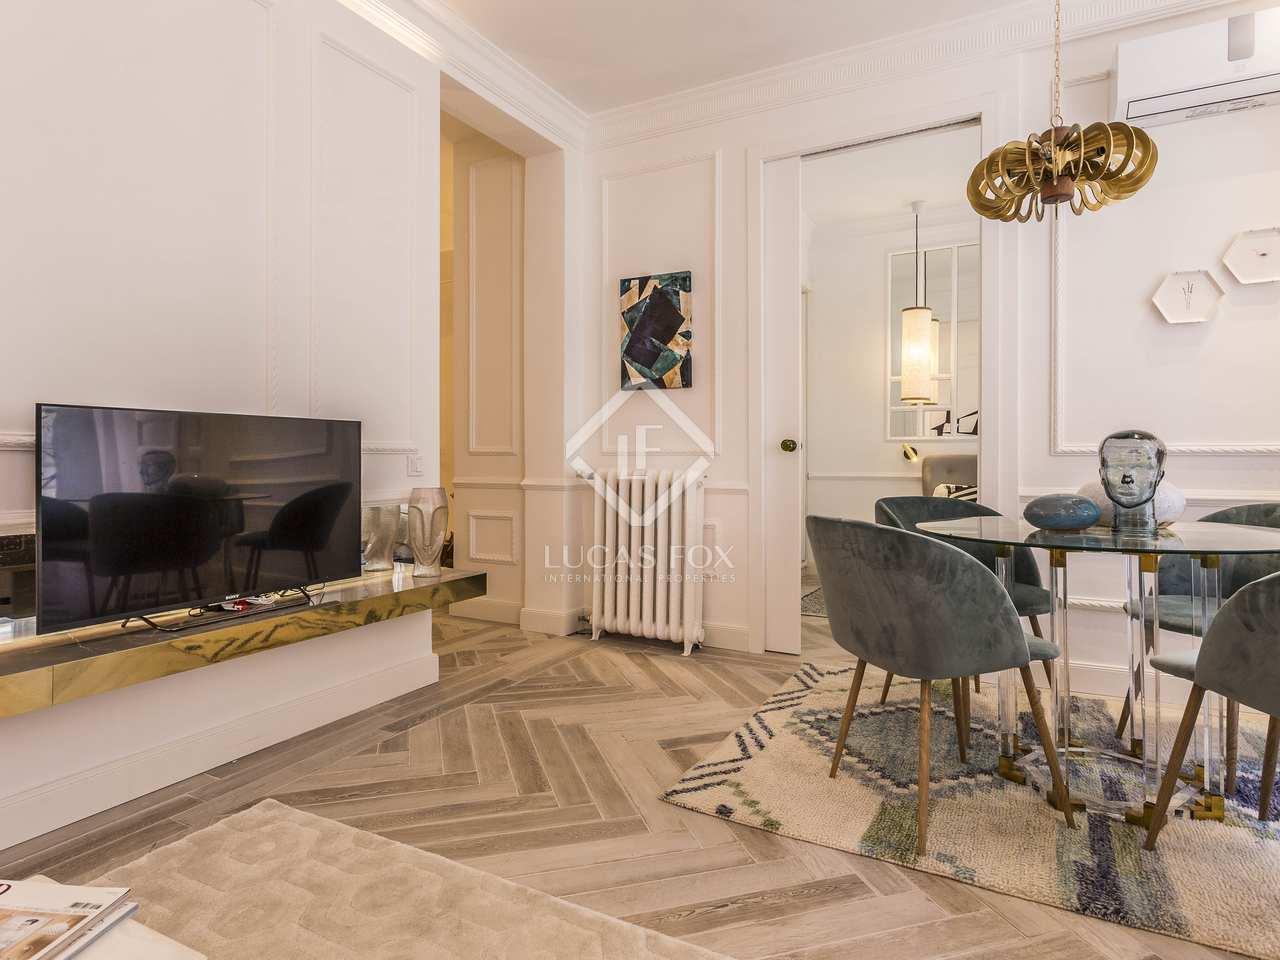 61m wohnung zur miete in hispanoam rica madrid. Black Bedroom Furniture Sets. Home Design Ideas